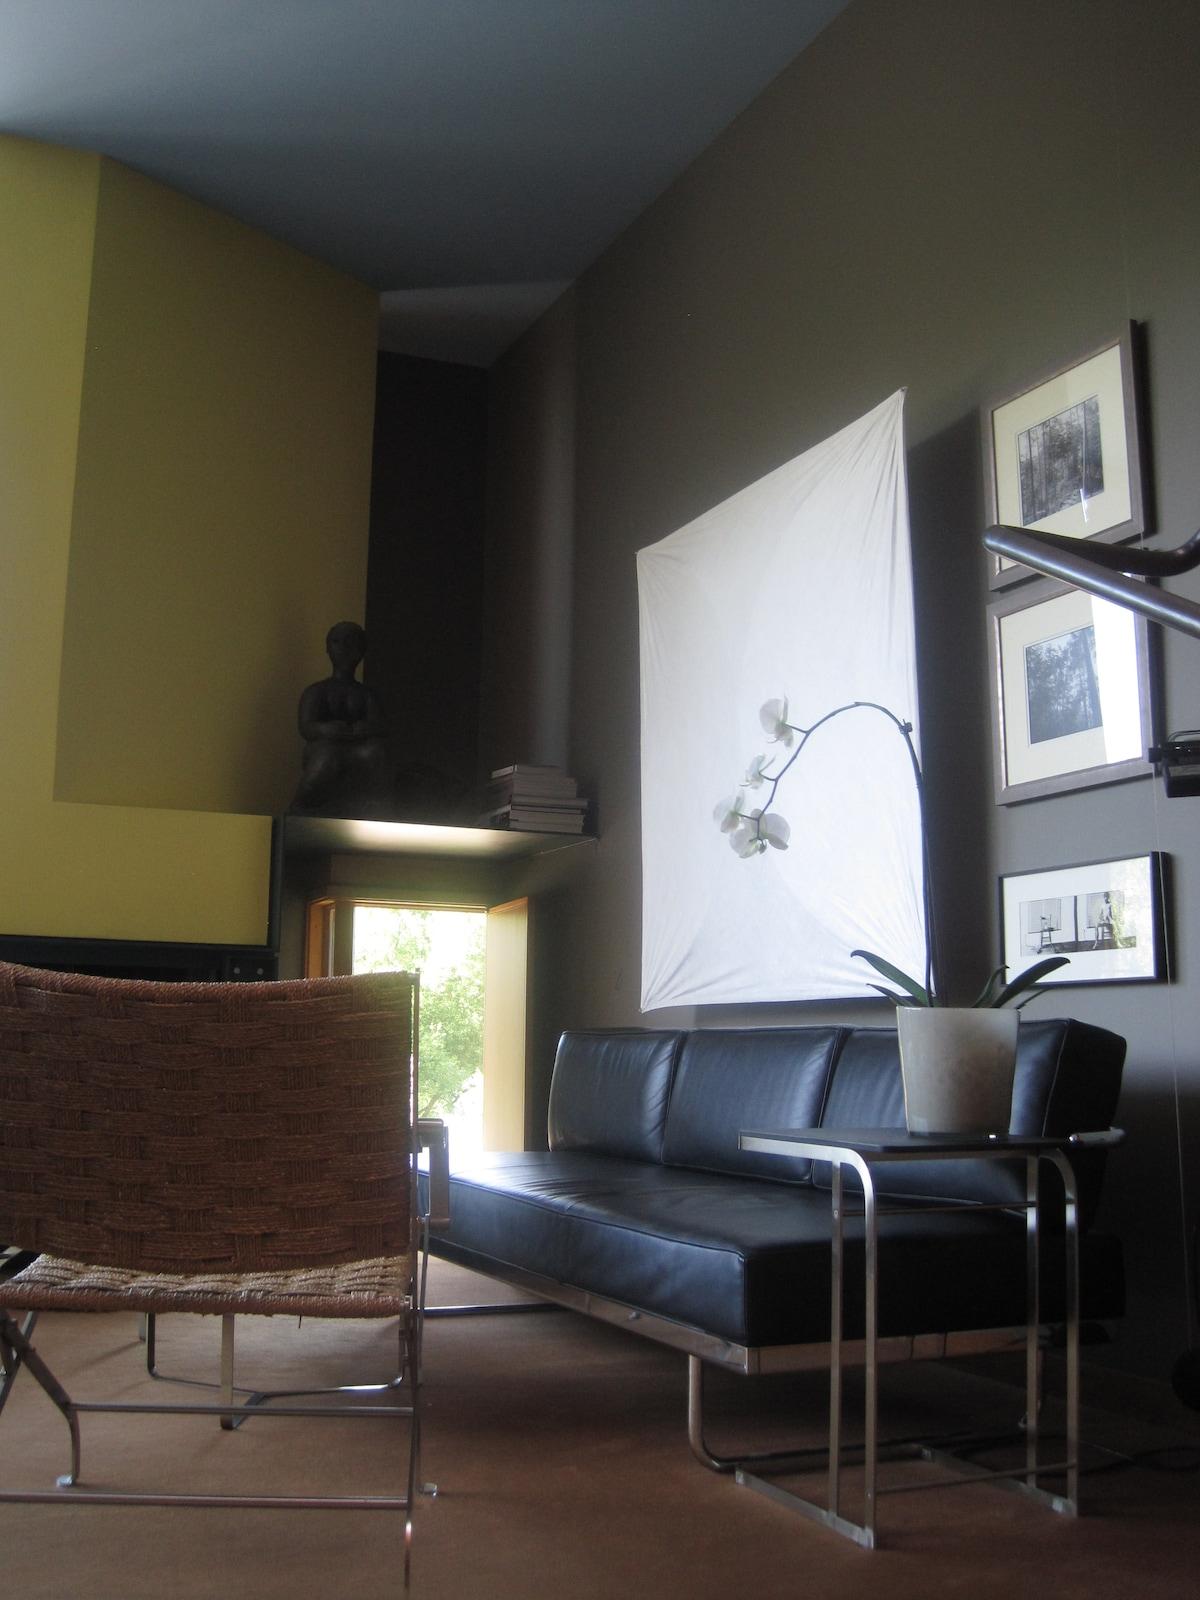 Living room of Rundles Morris House.  Designer furnishings, lighting, unique artwork, etc.